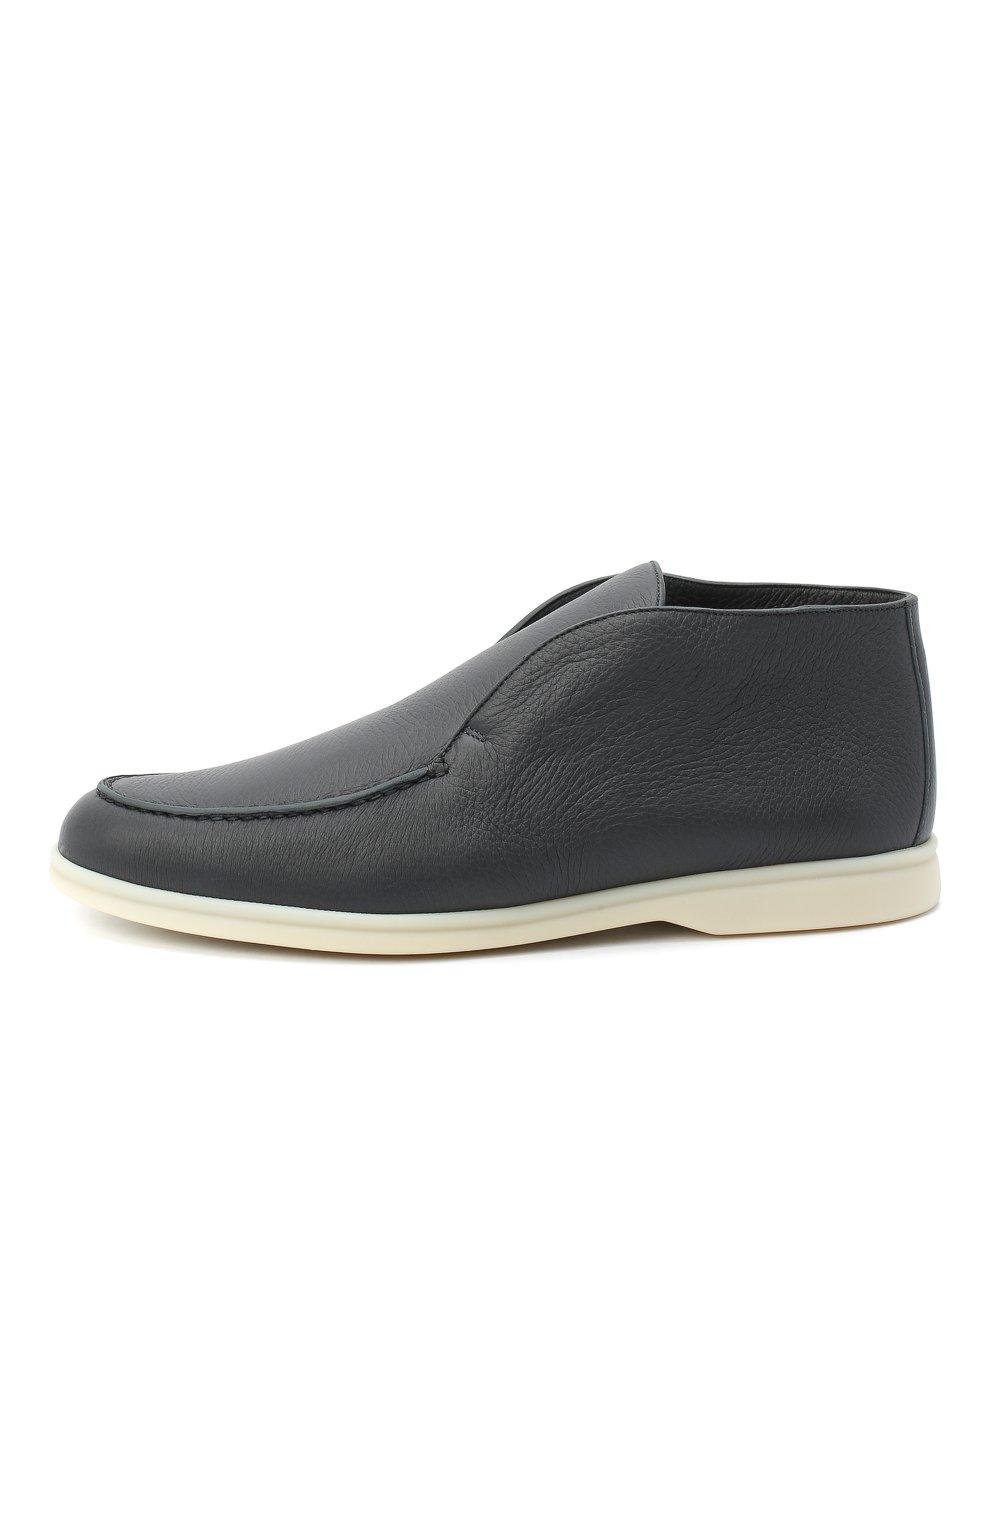 Мужские кожаные ботинки open walk LORO PIANA темно-серого цвета, арт. FAI3276 | Фото 3